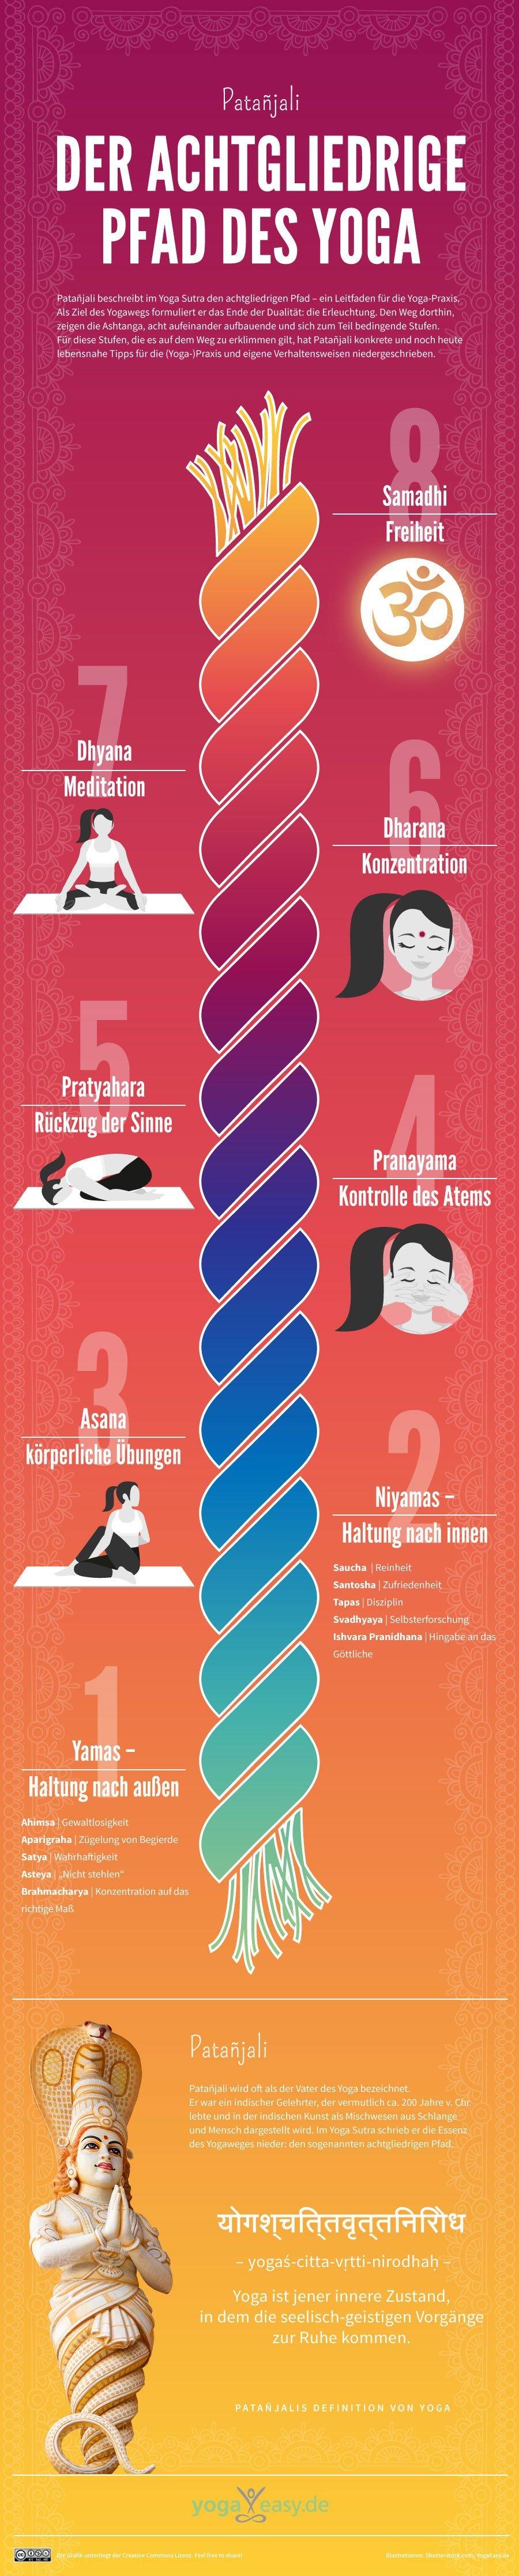 Infografik Patanjalis achtgliedriger Yogapfad